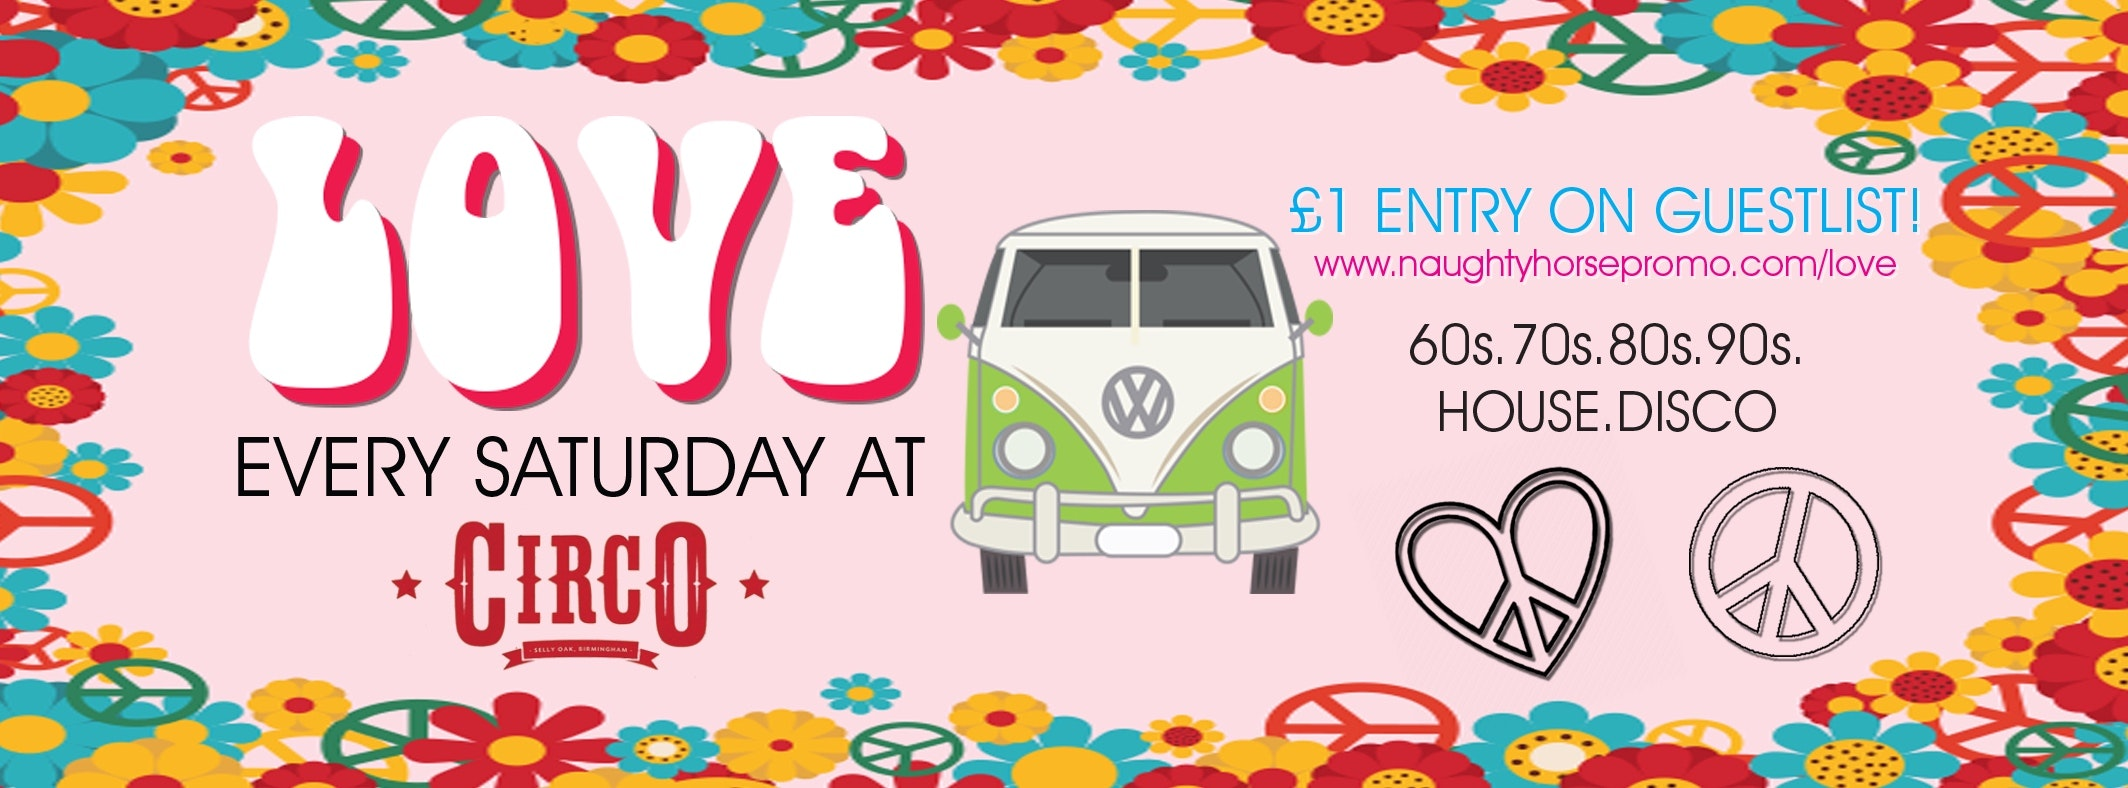 LOVE – Saturdays at Circo (Selly Oak) – £1 Entry guestlist!